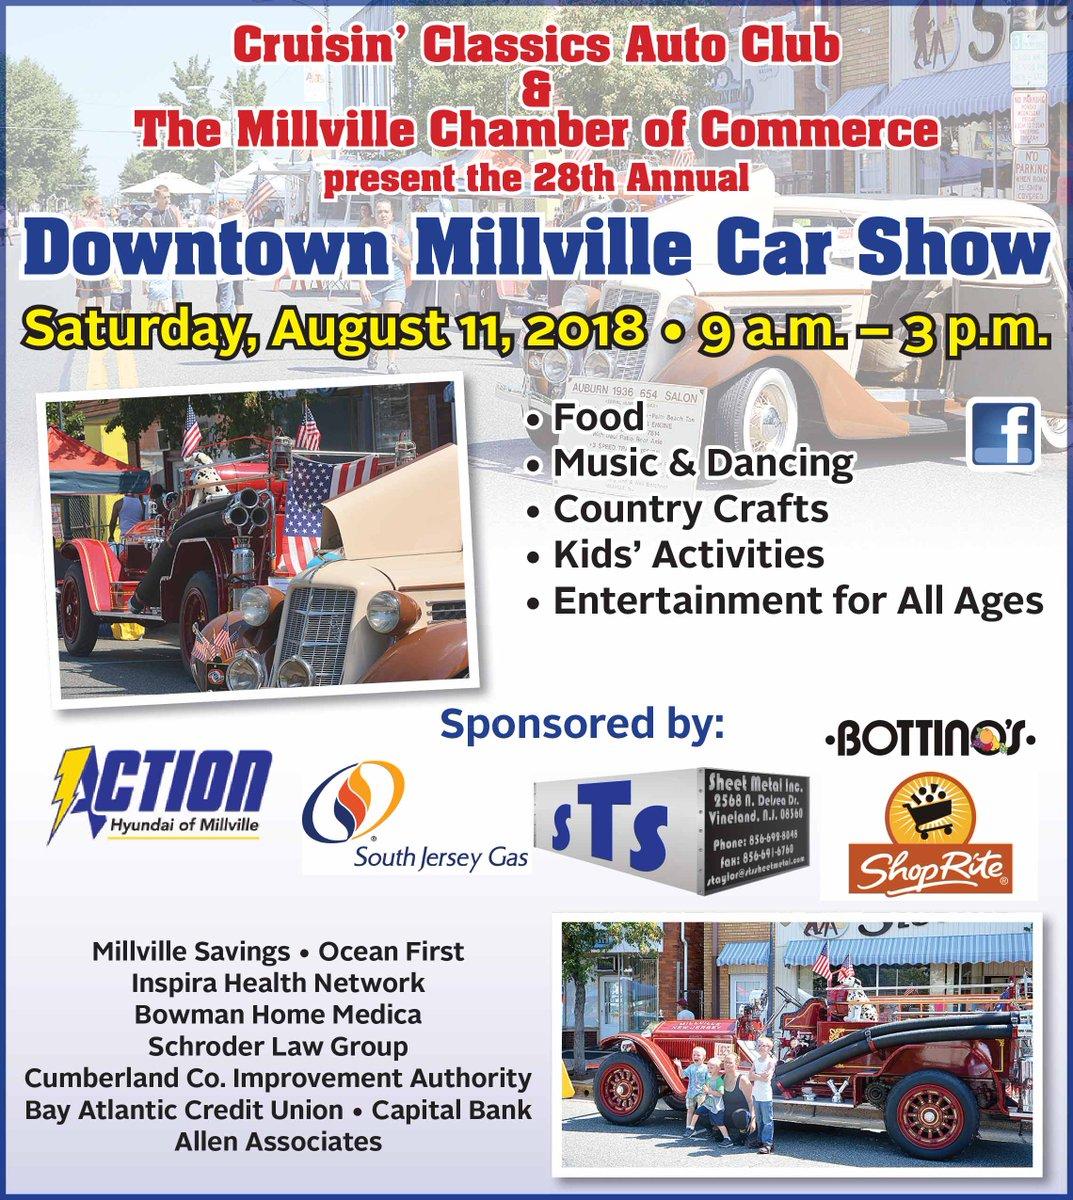 Jerry Covella GNCovella Twitter - Millville car show 2018